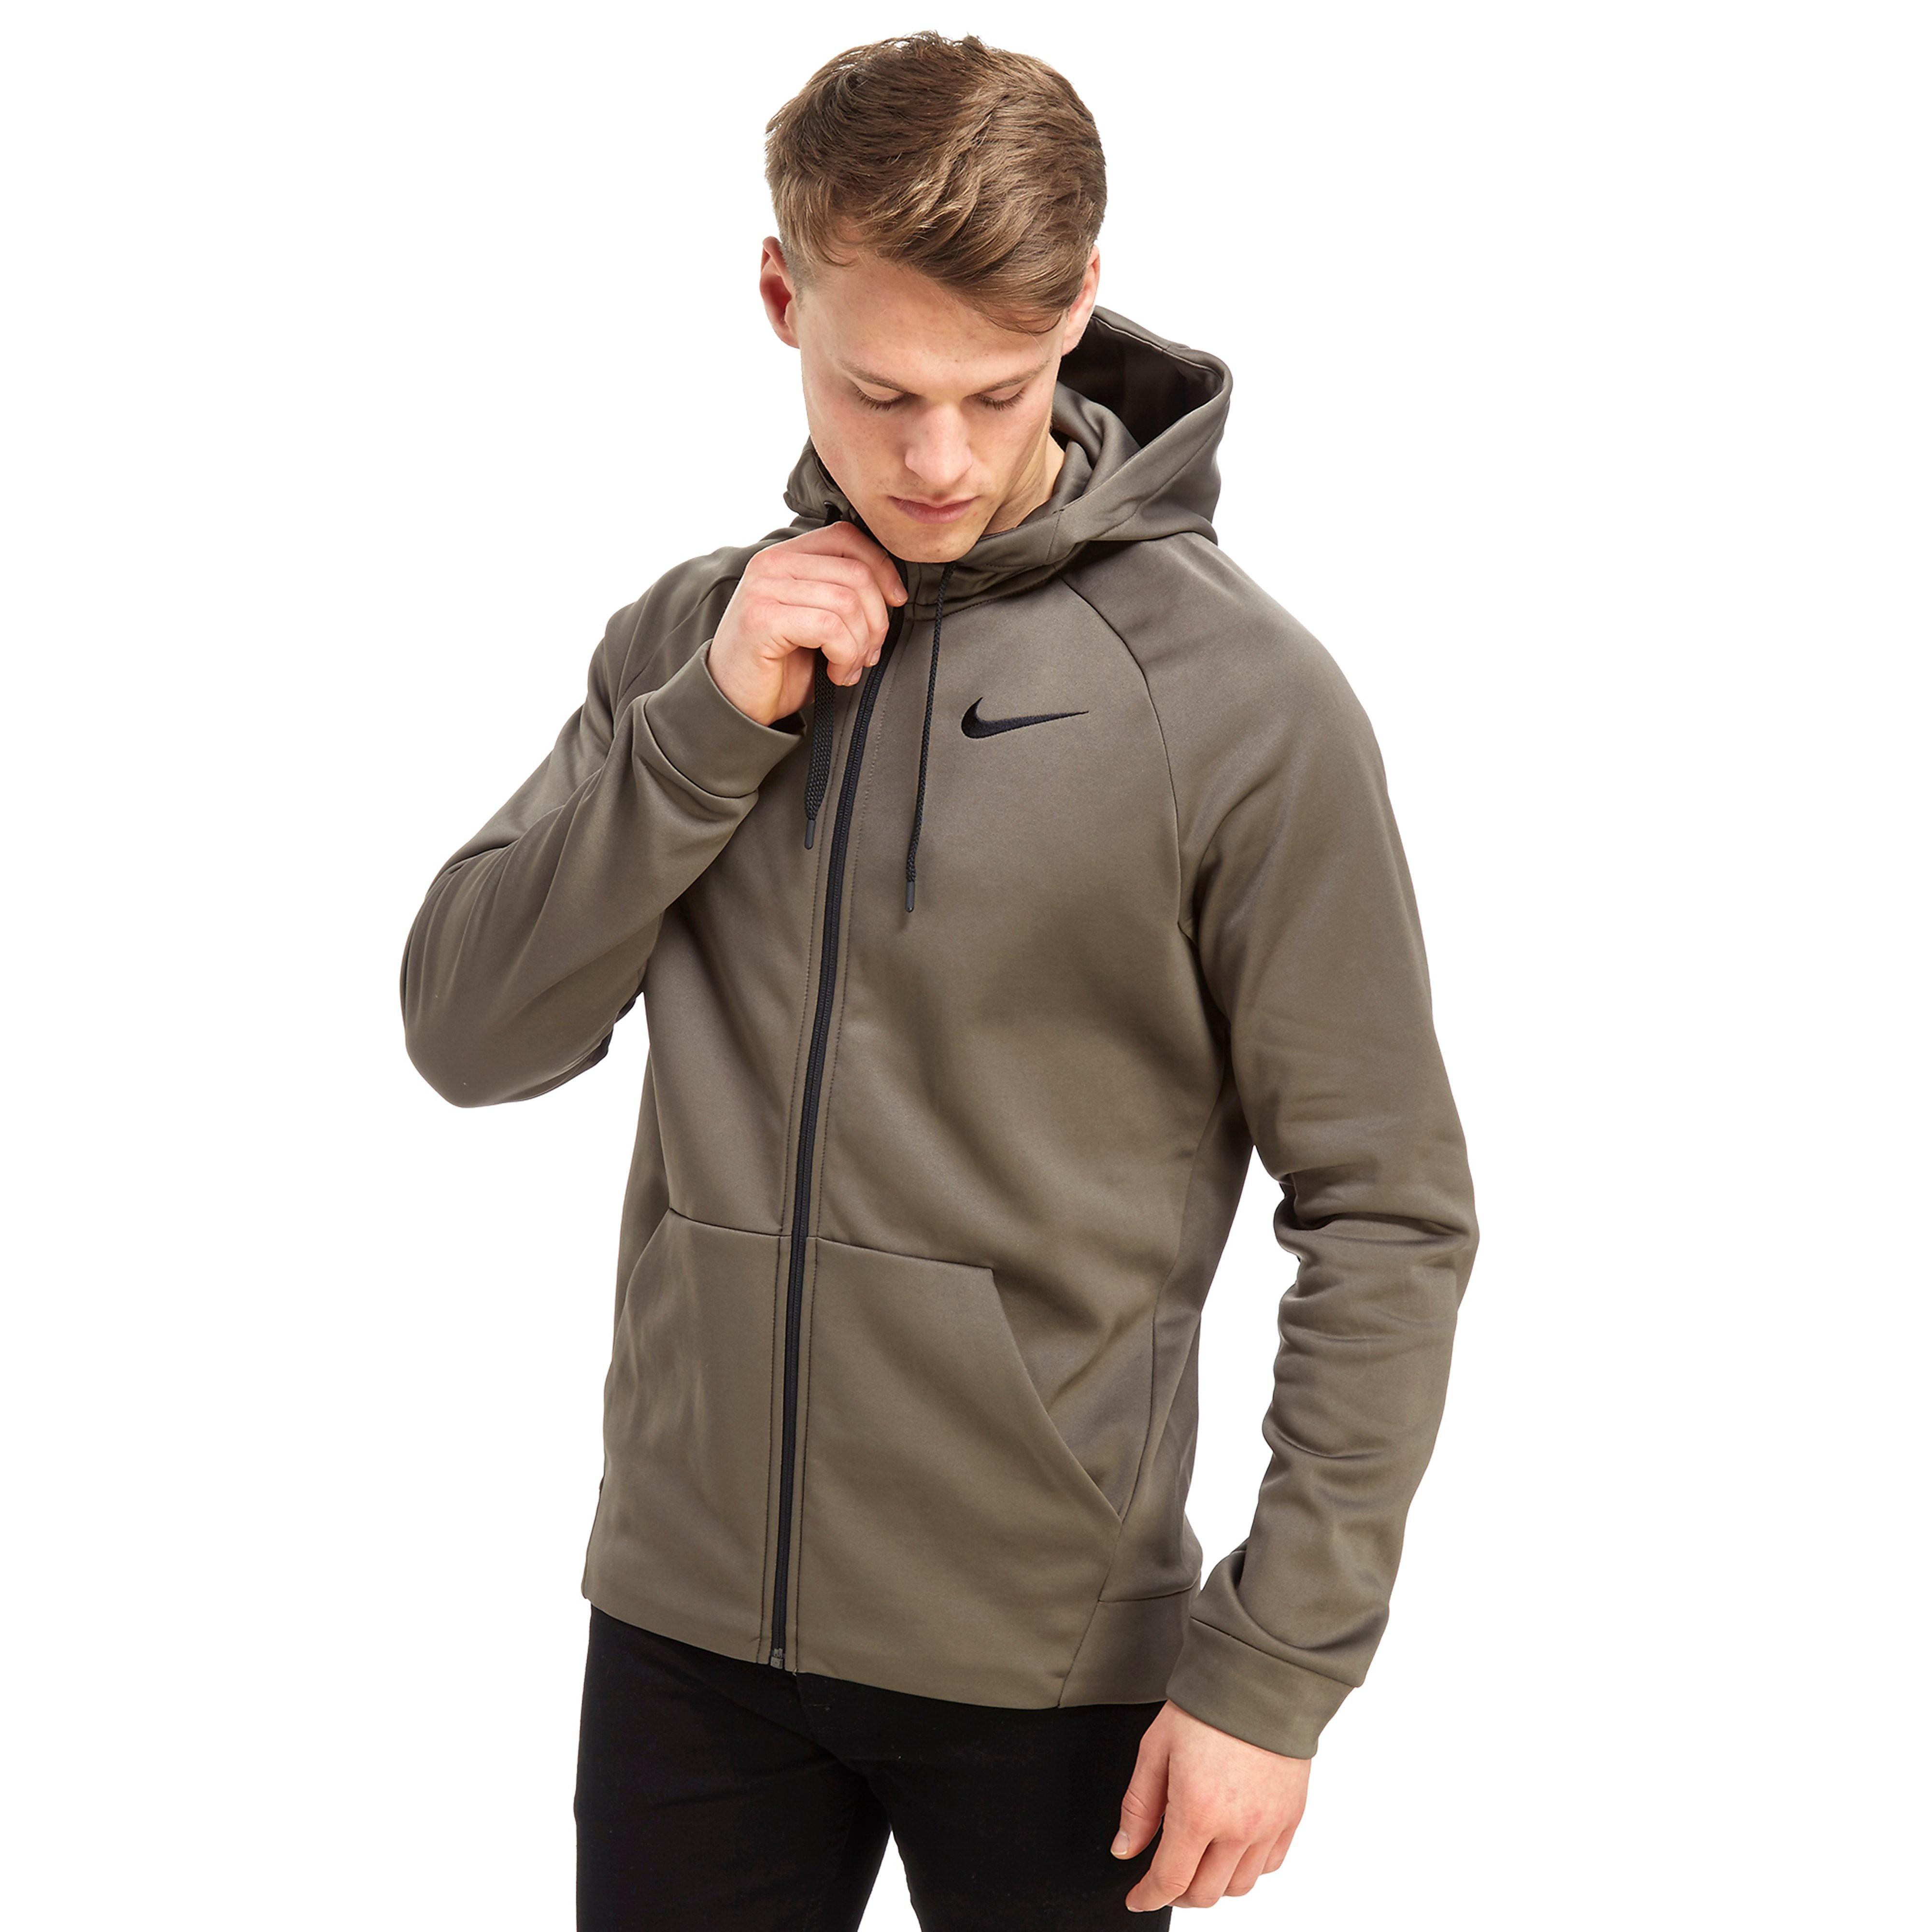 Nike Poly Hooded Men's Jacket